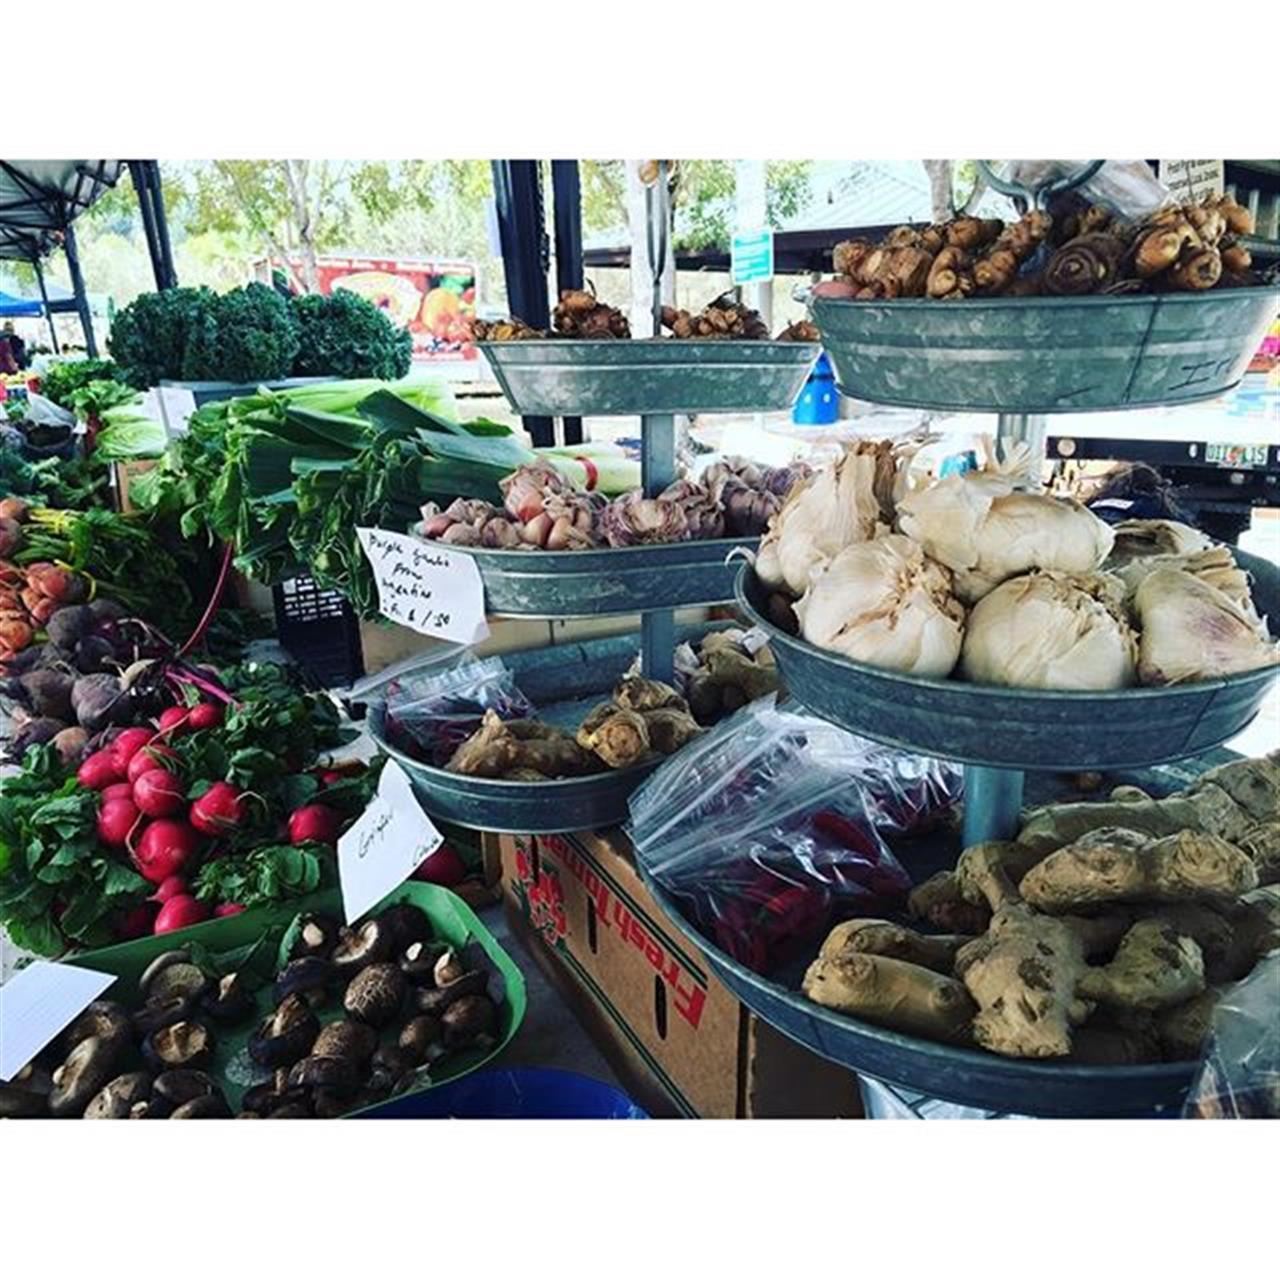 Farmers market #FortMyers #Florida